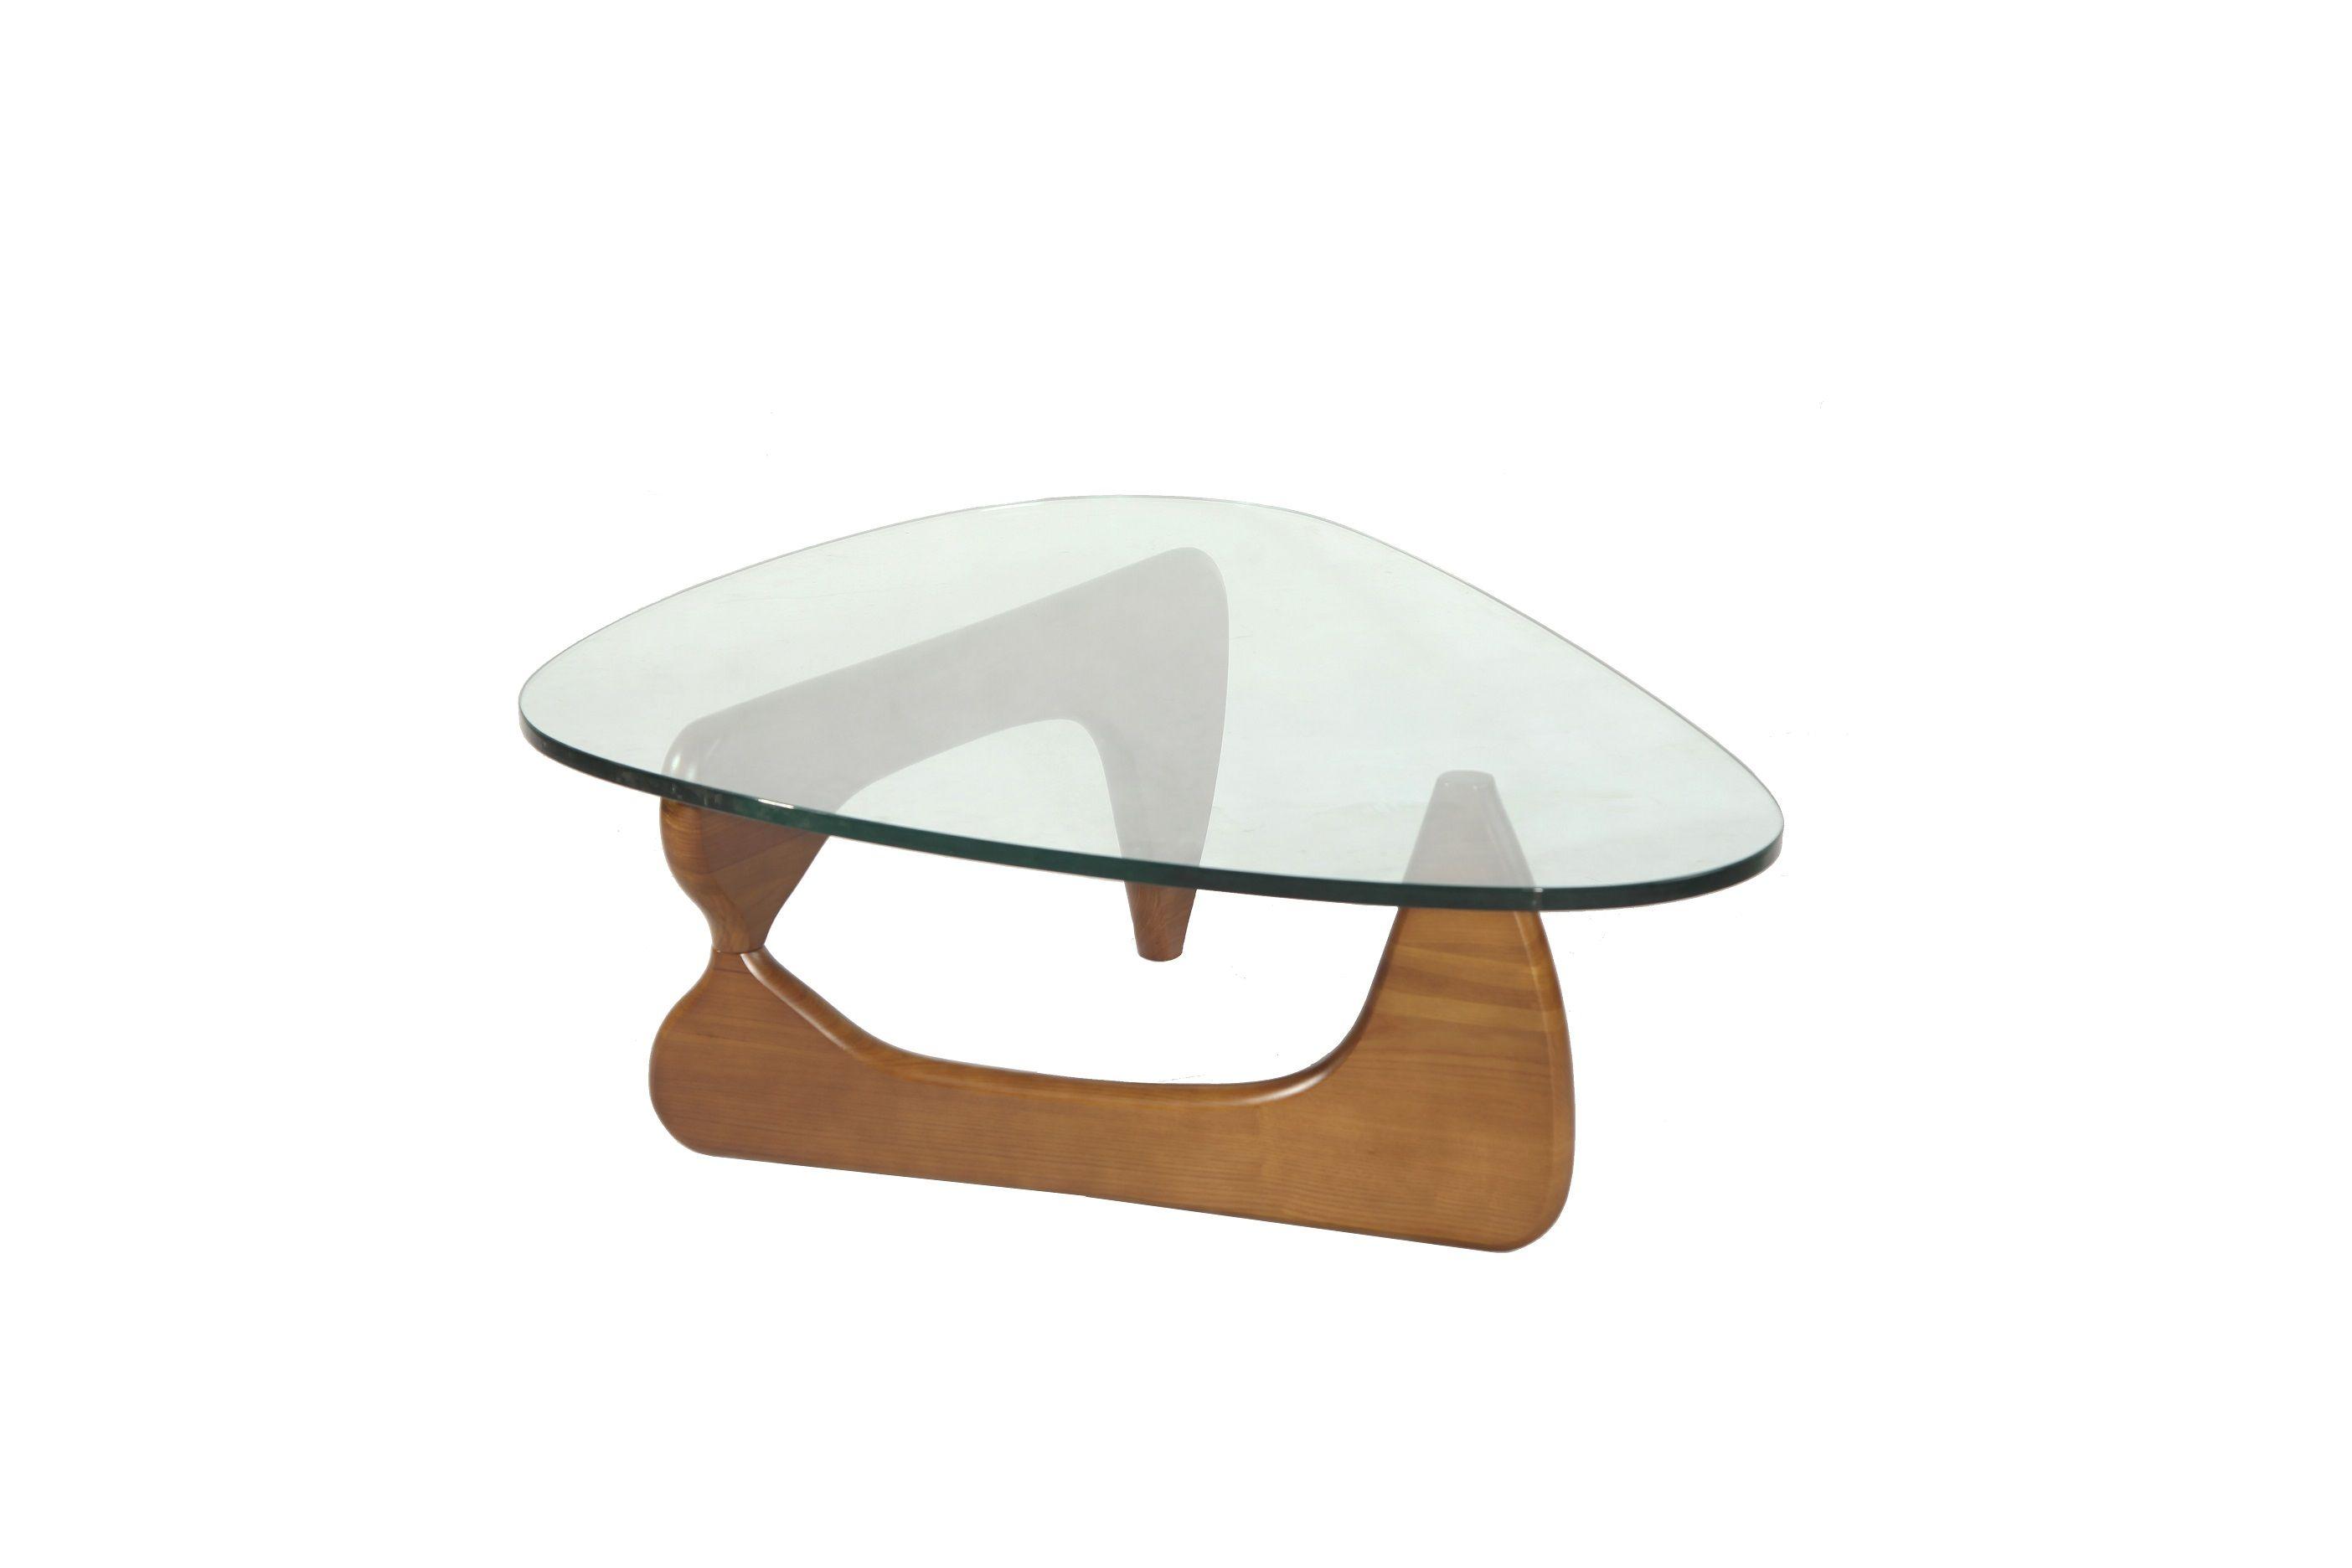 Light walnut Isamu noguchi coffee table with 19mm tempered glass